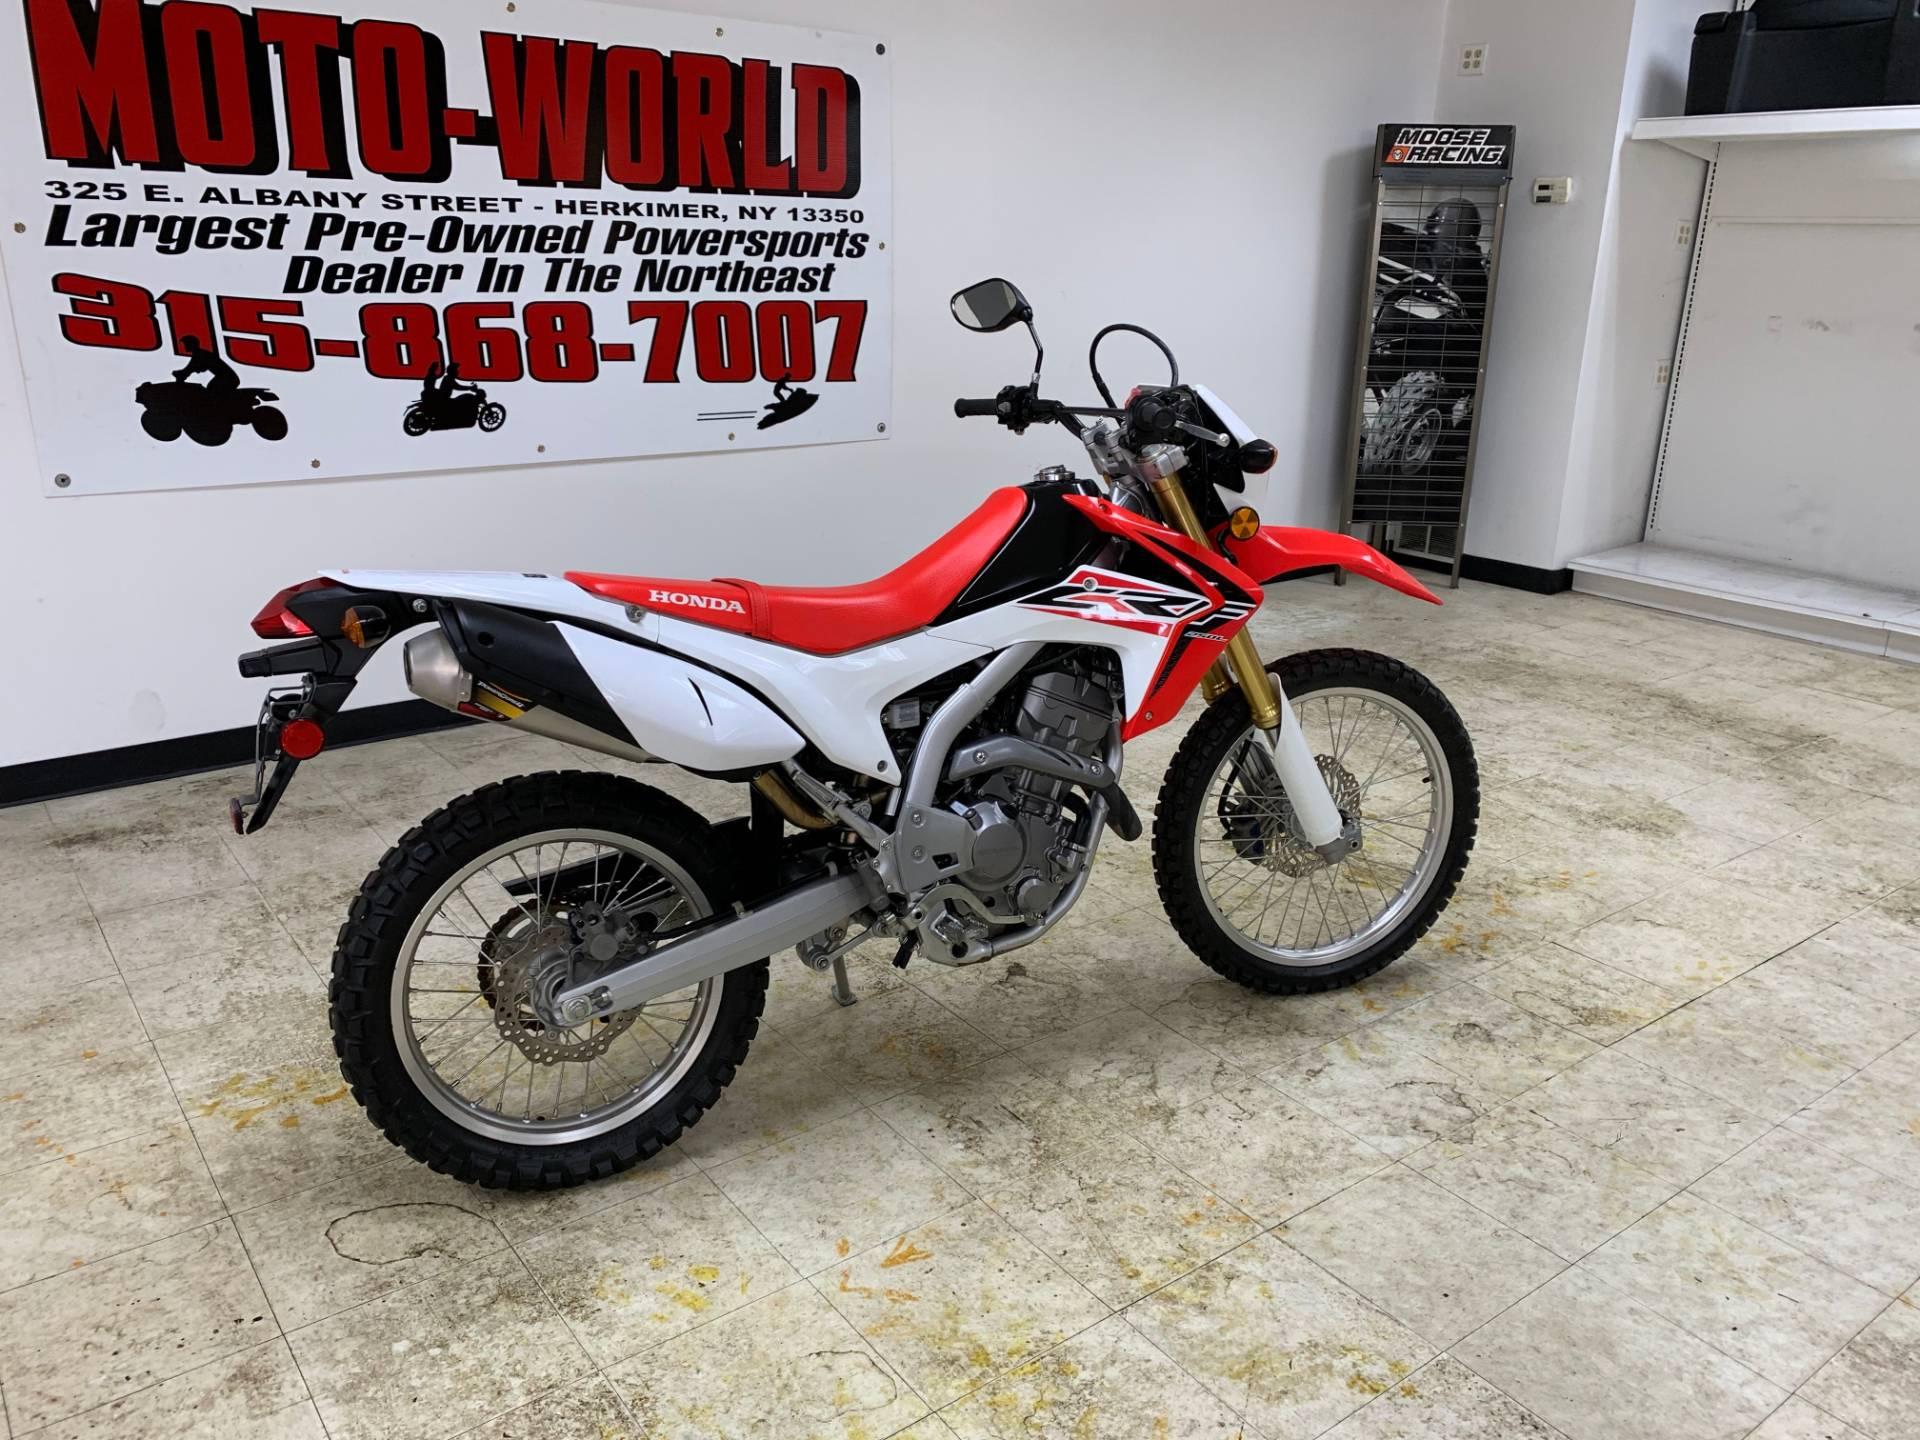 Bmw Dealers Long Island >> Honda Motorcycle Dealership Albany Ny | 1stmotorxstyle.org